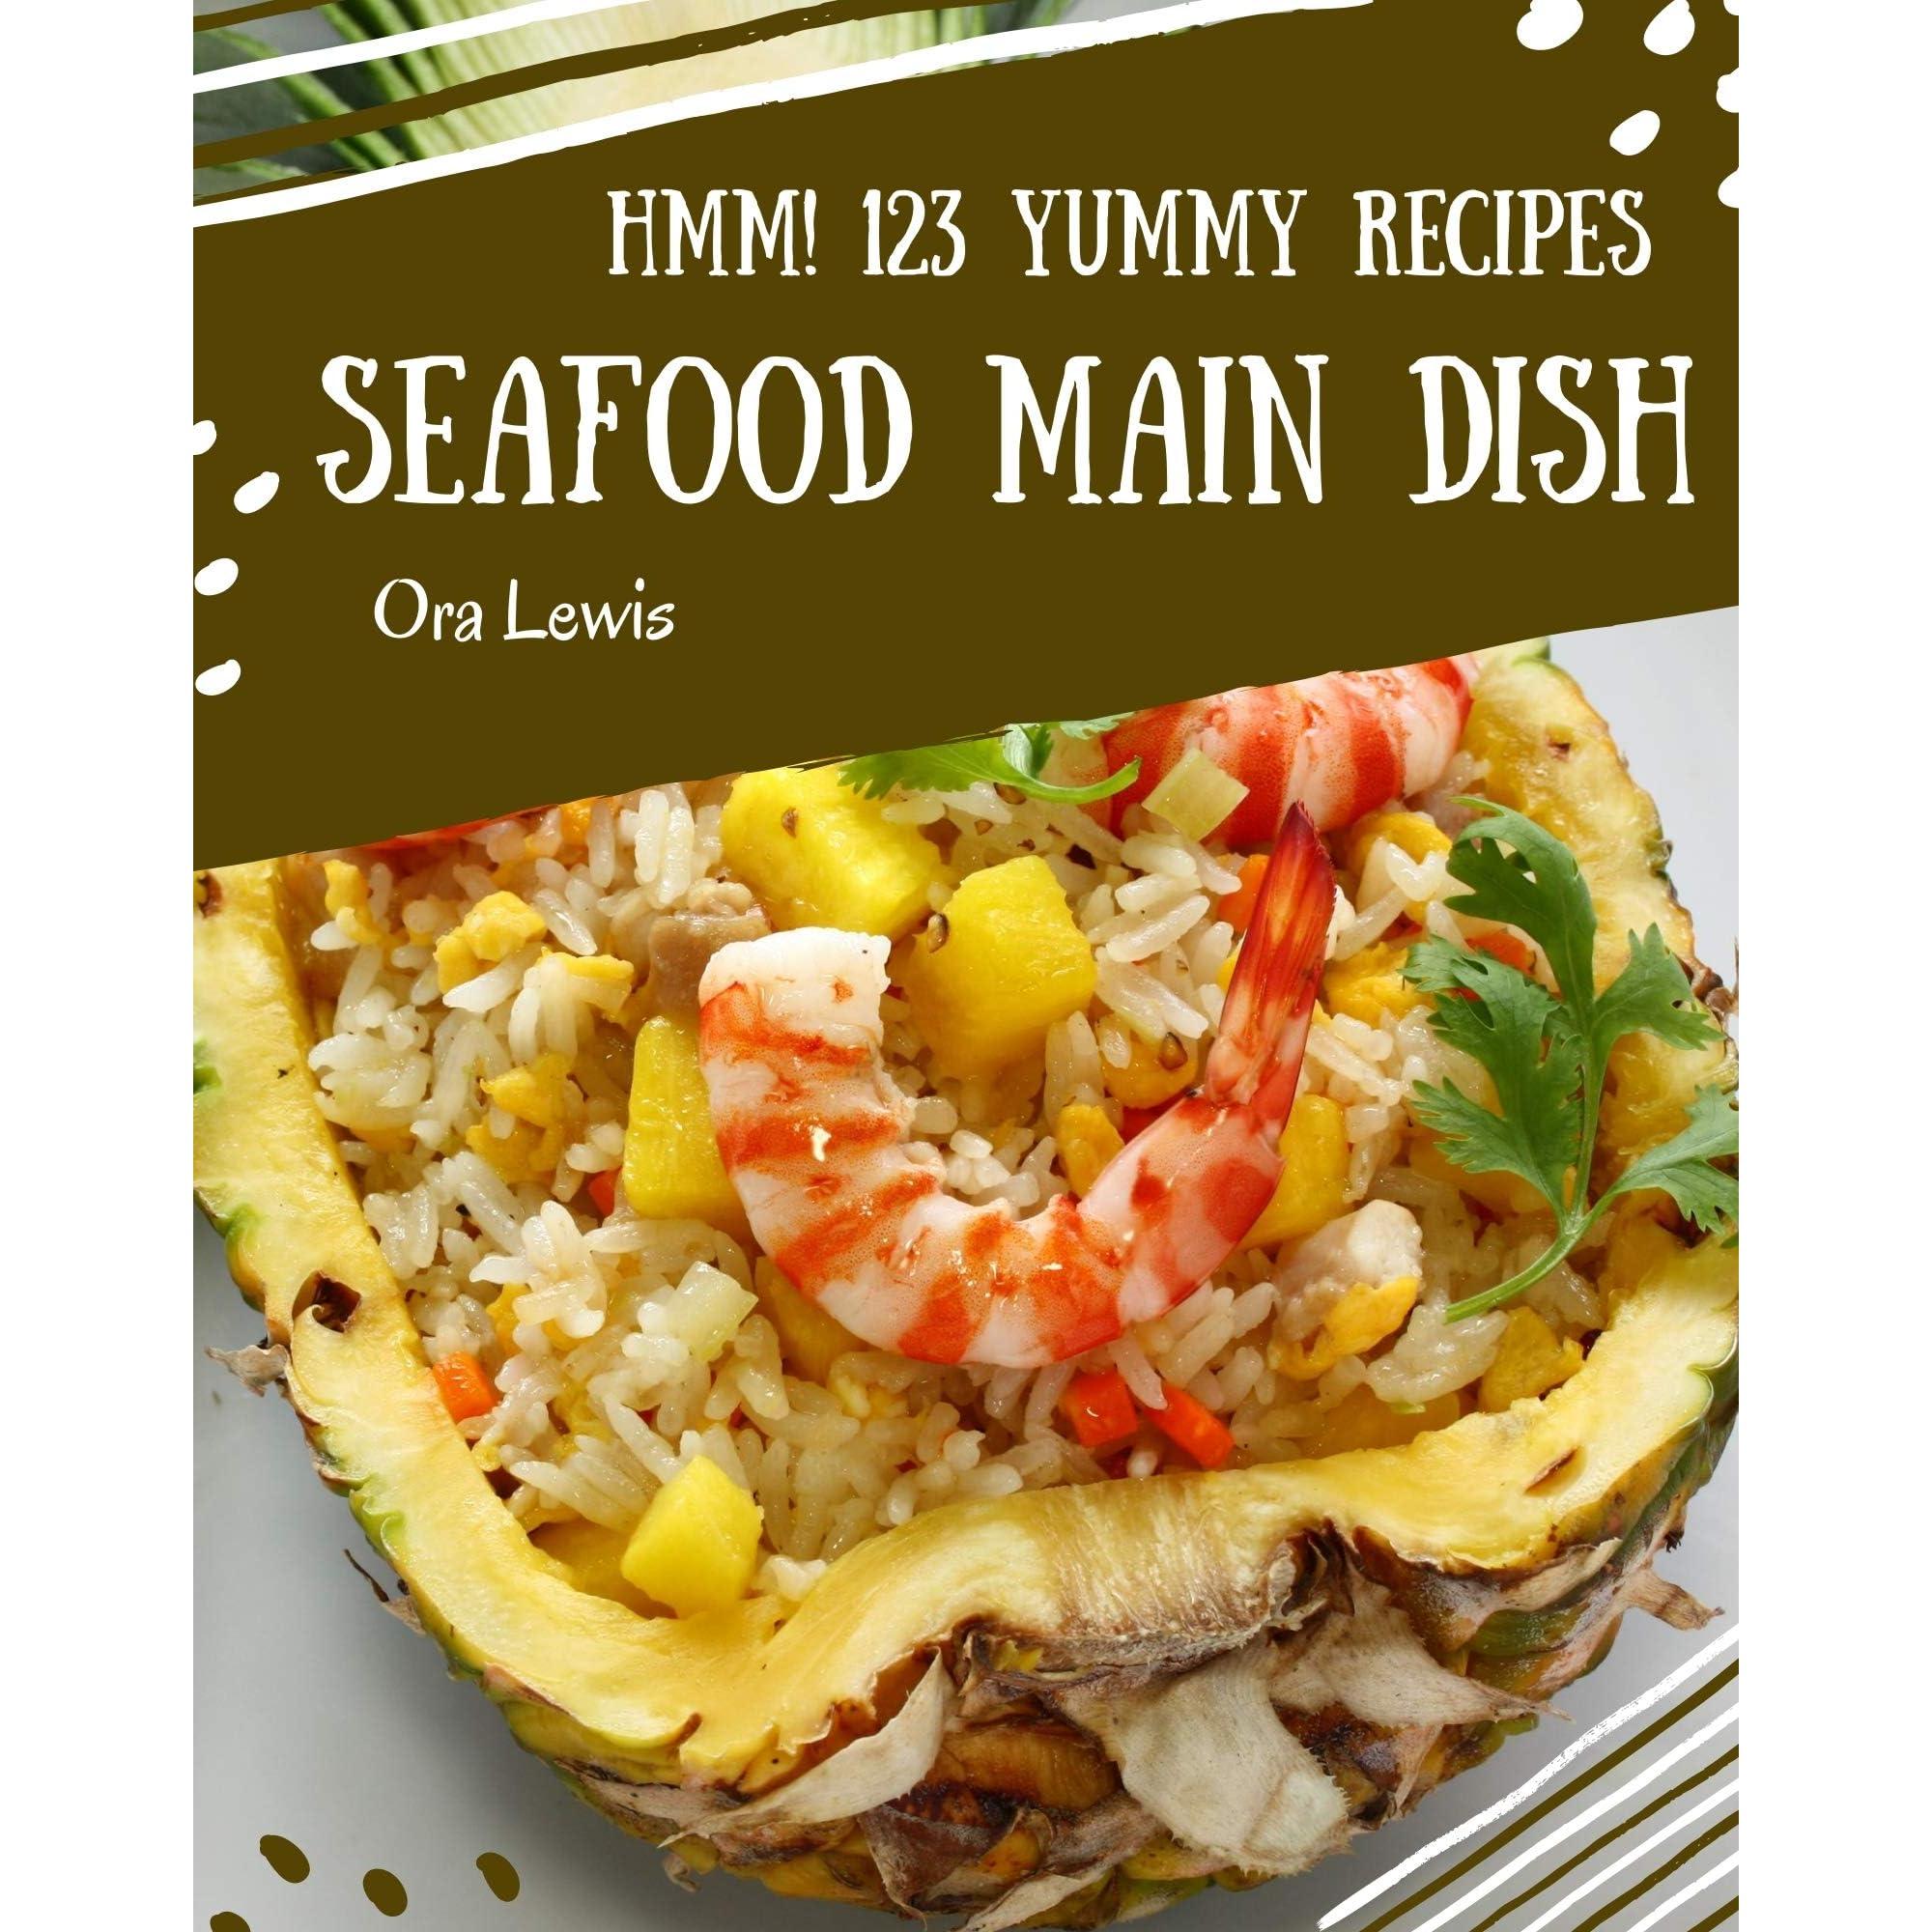 123 Yummy Seafood Main Dish Recipes ...